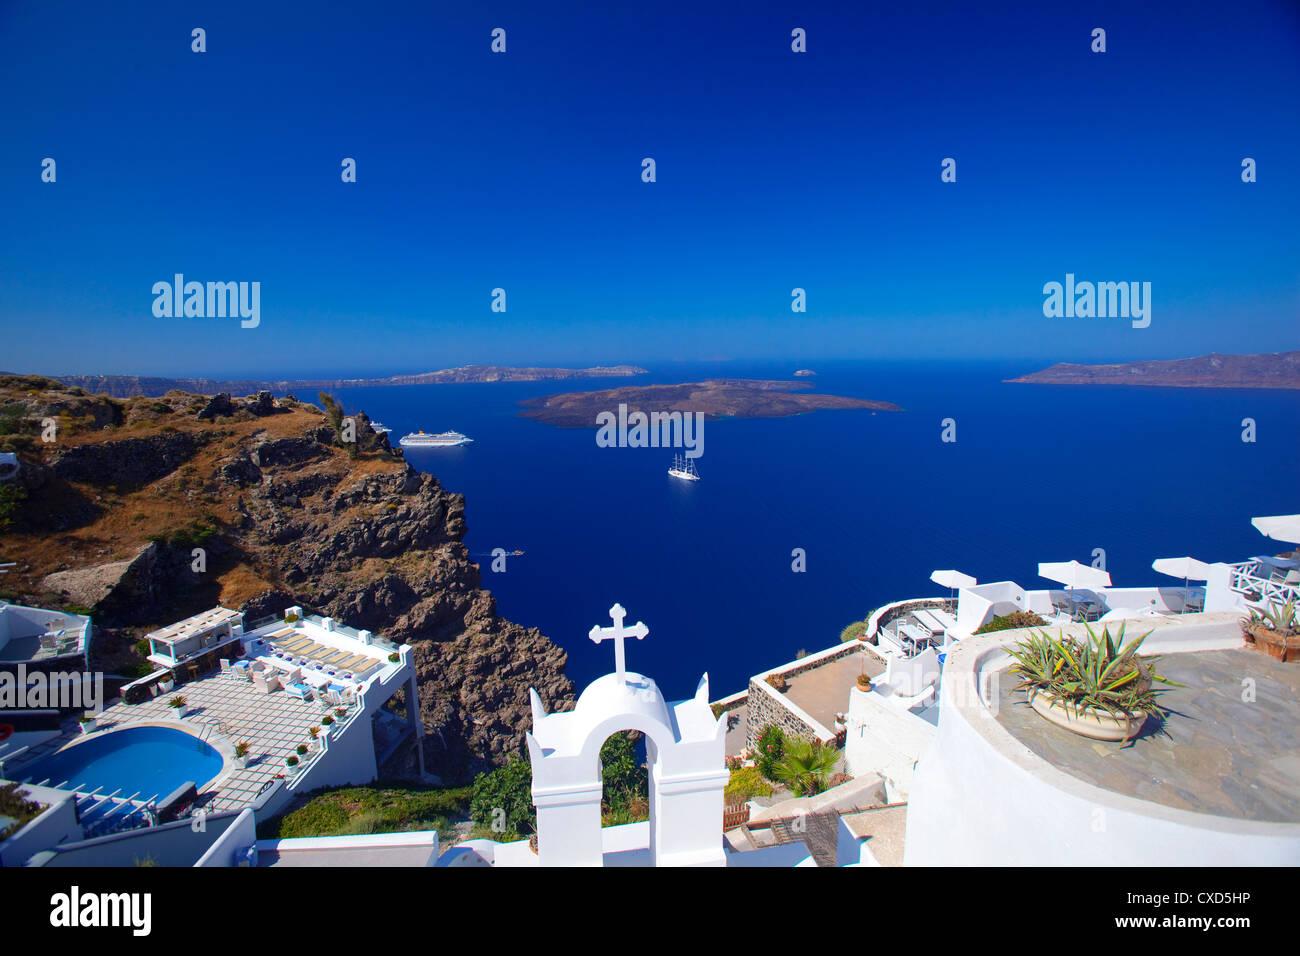 Vue de la caldeira de Fira, Santorini, Cyclades, îles grecques, Grèce, Europe Photo Stock